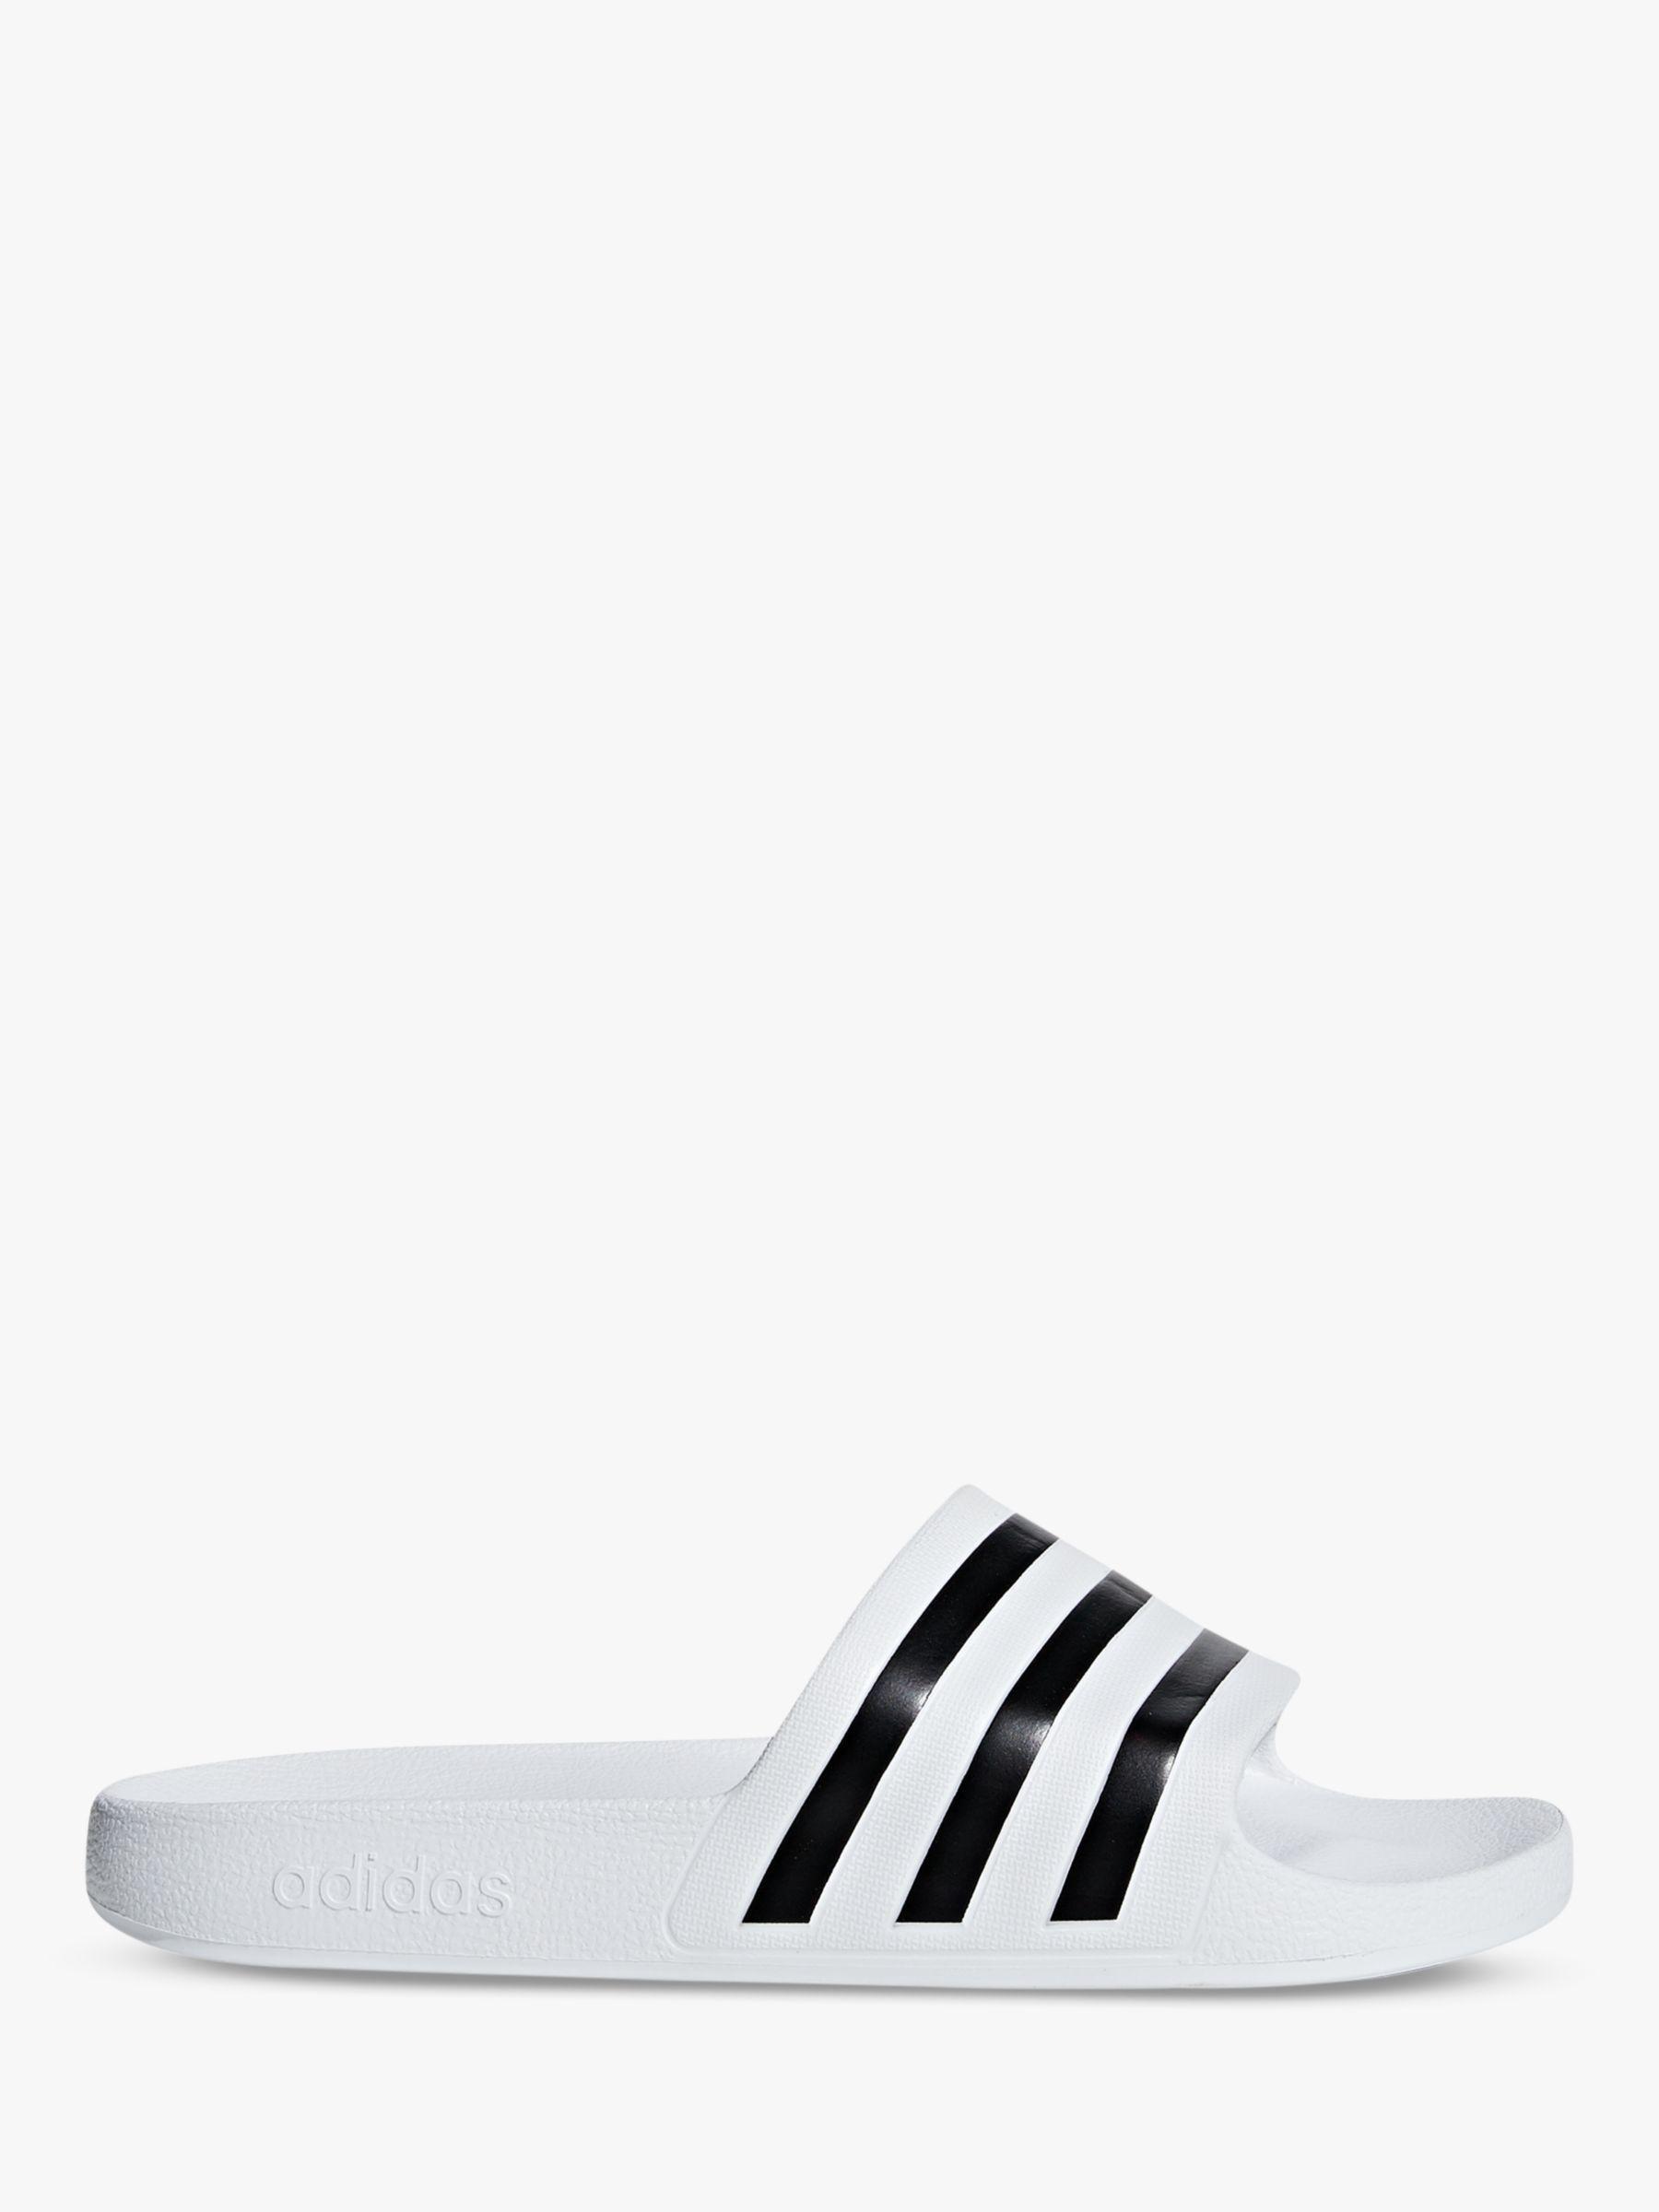 wholesale dealer f90f6 cf84f Adidas - Black Adilette Aqua Women s Slides Slippers - Lyst. View fullscreen